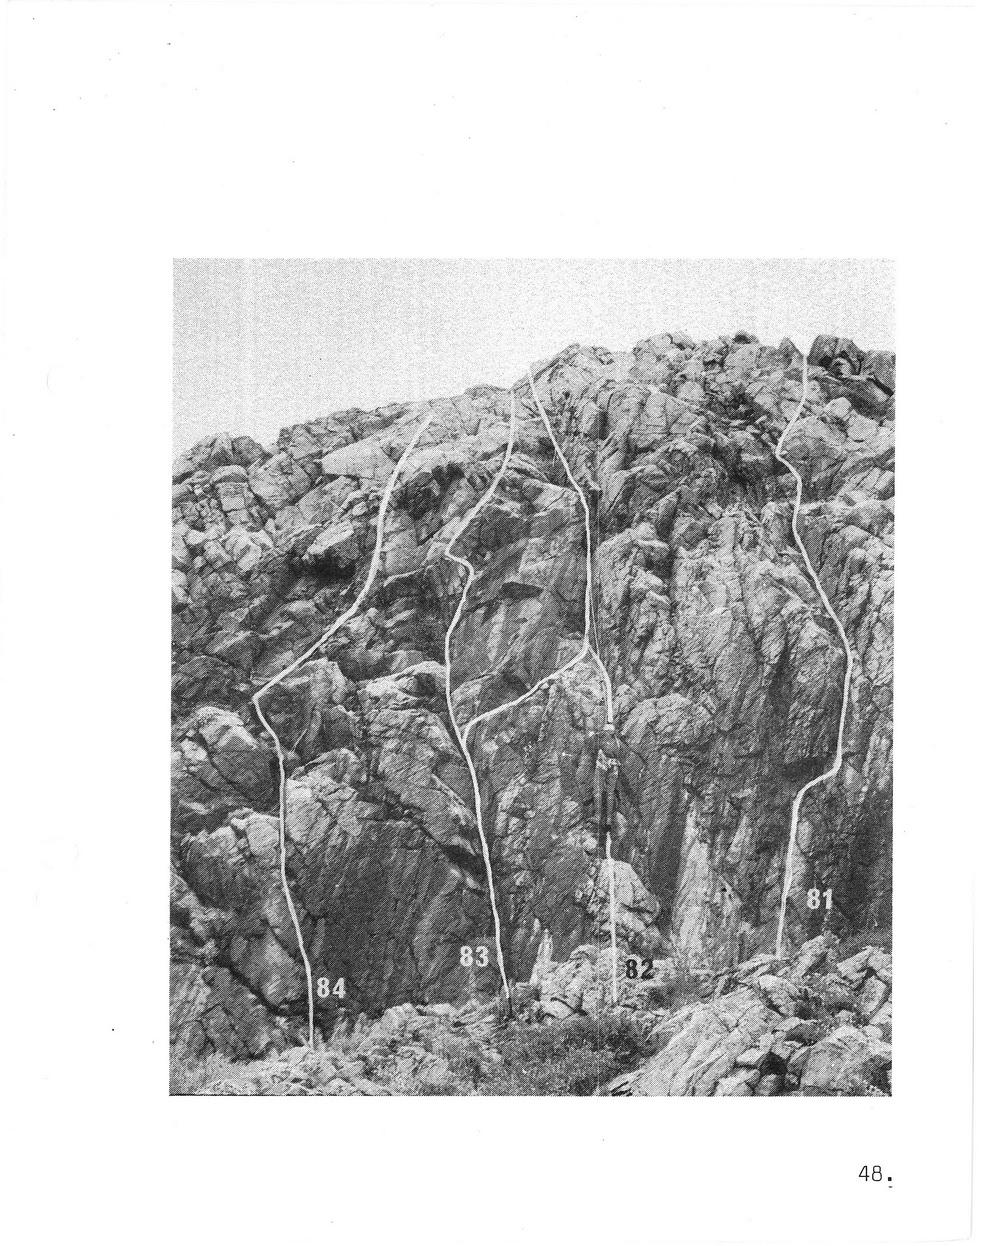 Kullen guide 1972 048.jpg